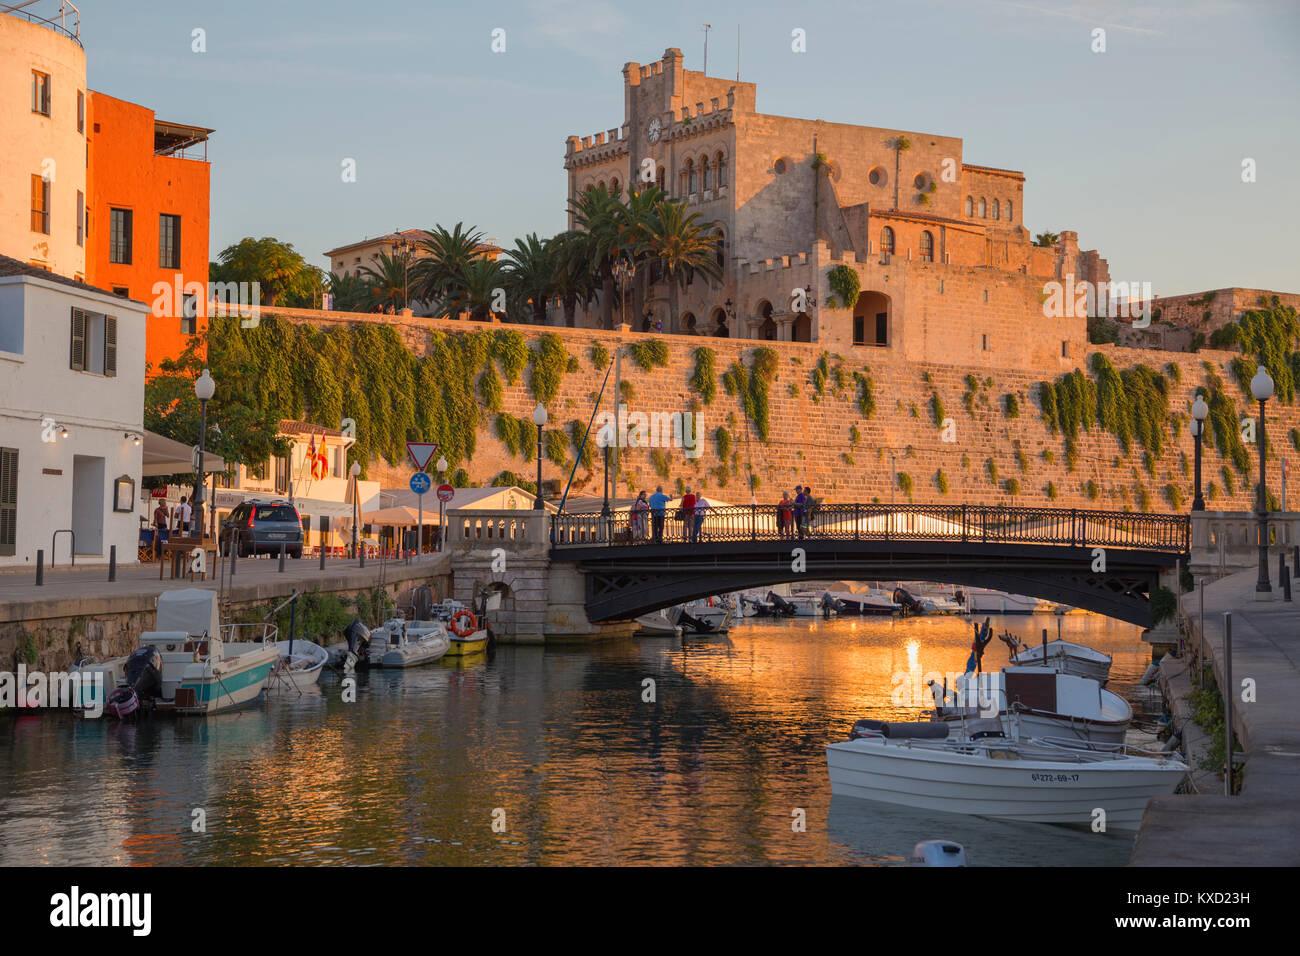 Historic Old Harbour, Ciutadella, Menorca, Islas Baleares, España, Europa, Imagen De Stock